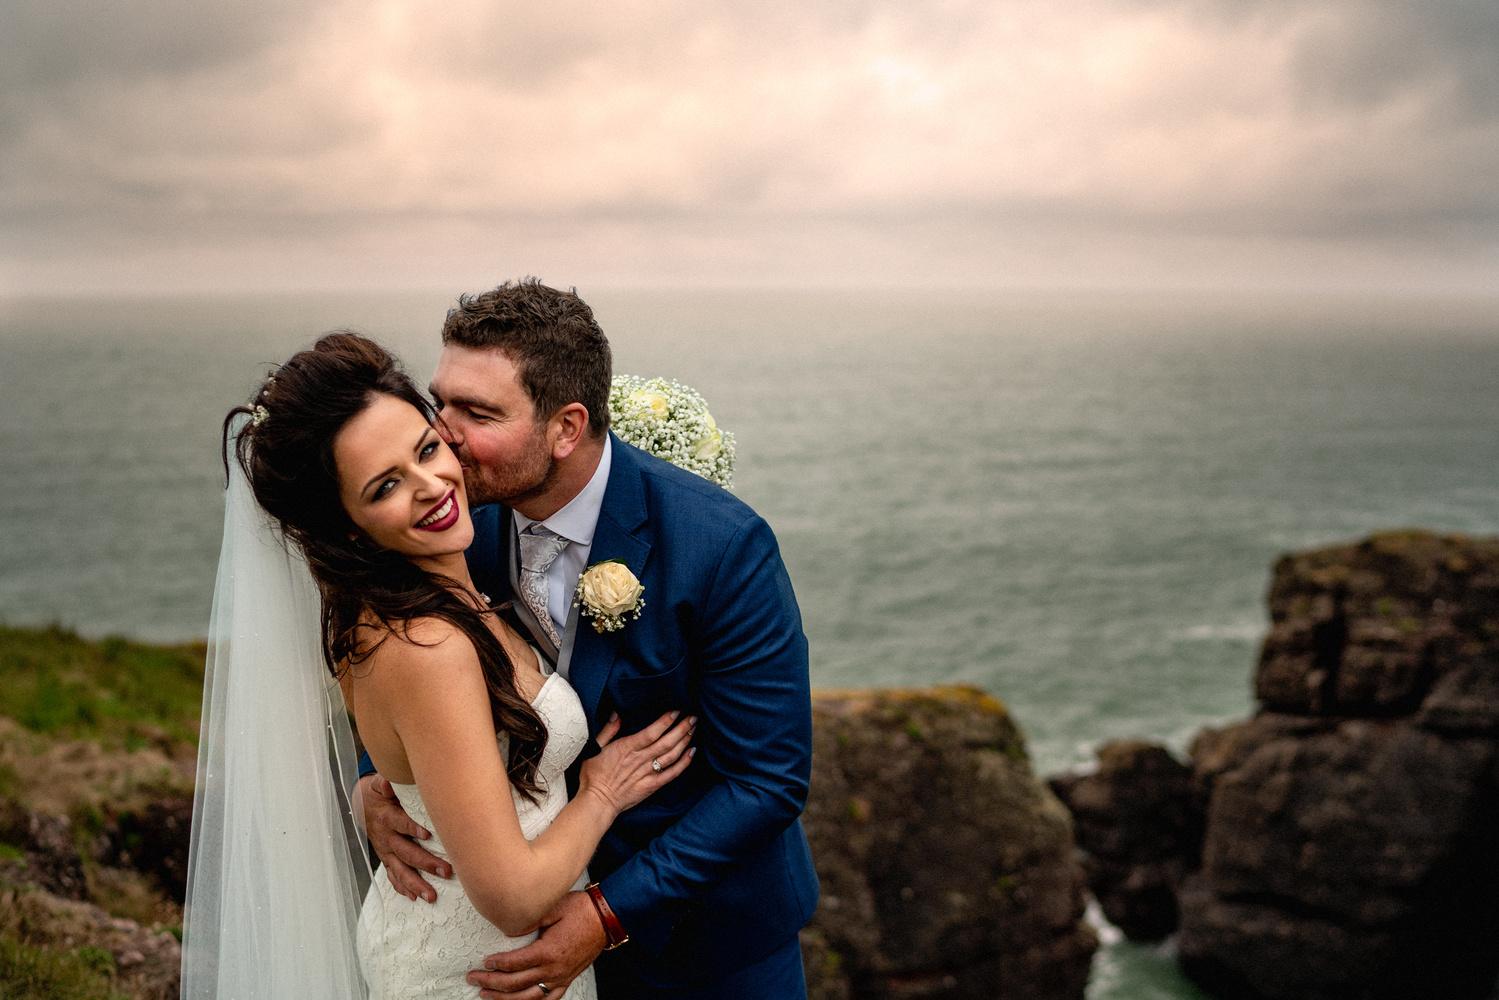 That Wedding Day Smile by David O Sullivan